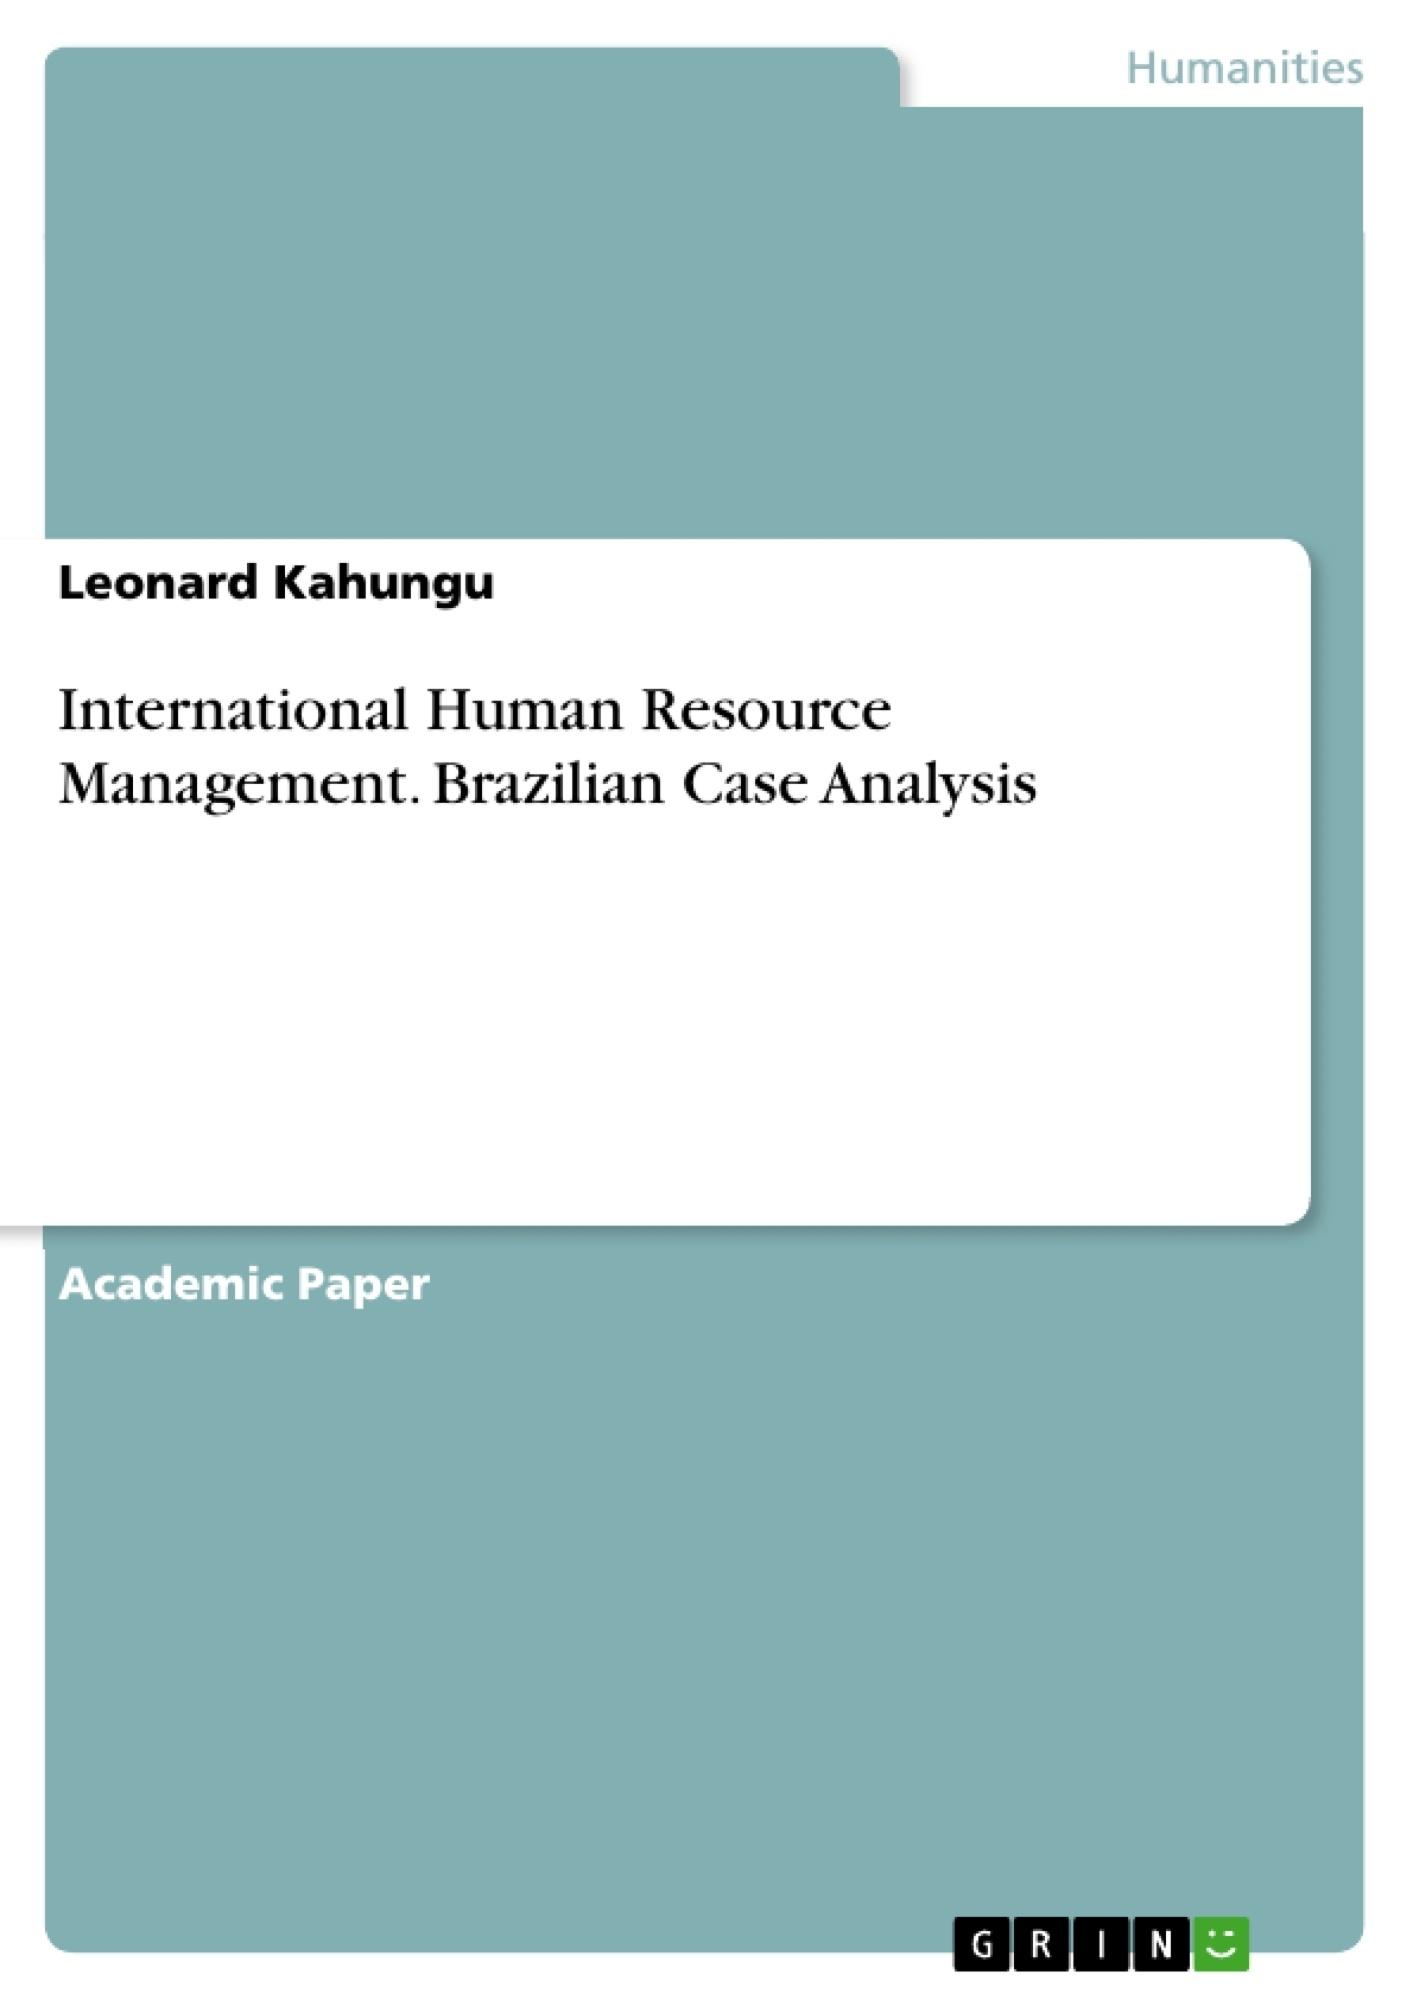 Title: International Human Resource Management. Brazilian Case Analysis